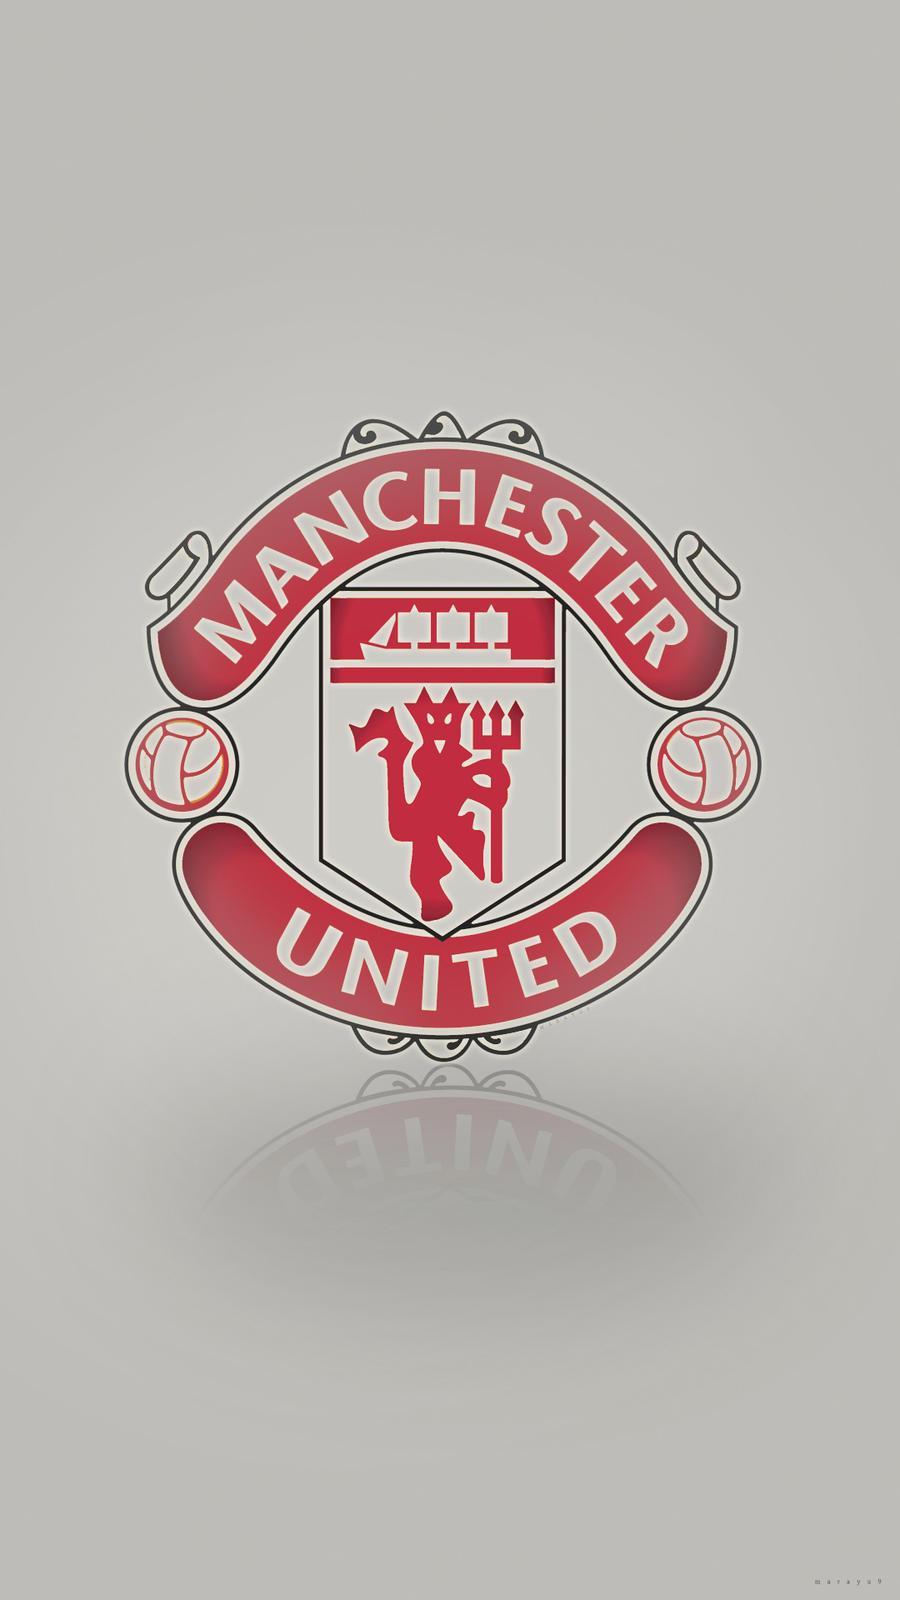 Phone Wallpaper Manchester United by MaRaYu9 on DeviantArt